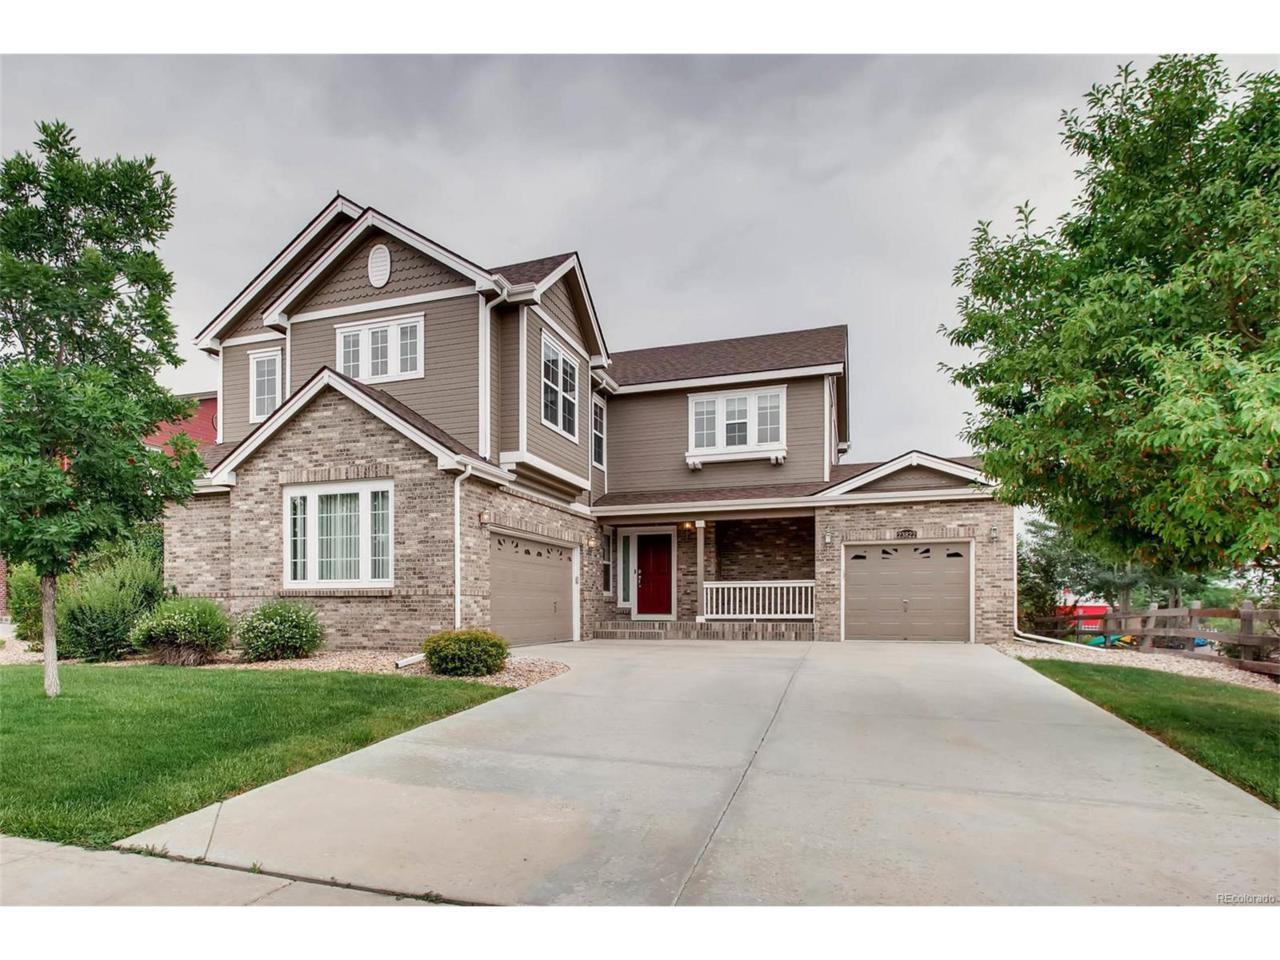 23822 E 2nd Drive, Aurora, CO 80018 (MLS #6990365) :: 8z Real Estate